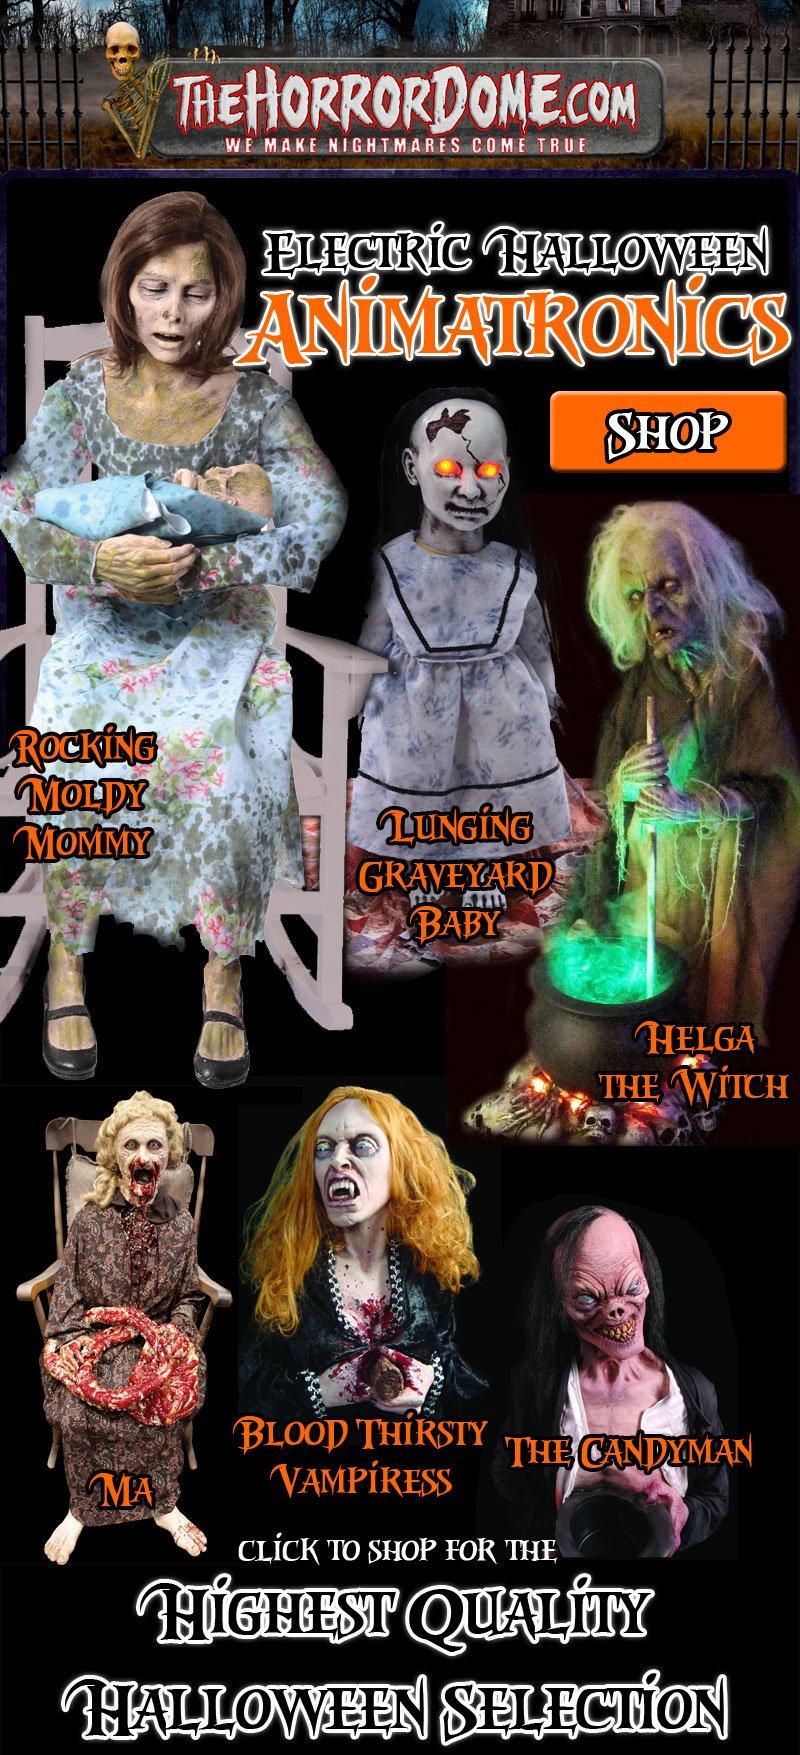 Electric Halloween Animatronics